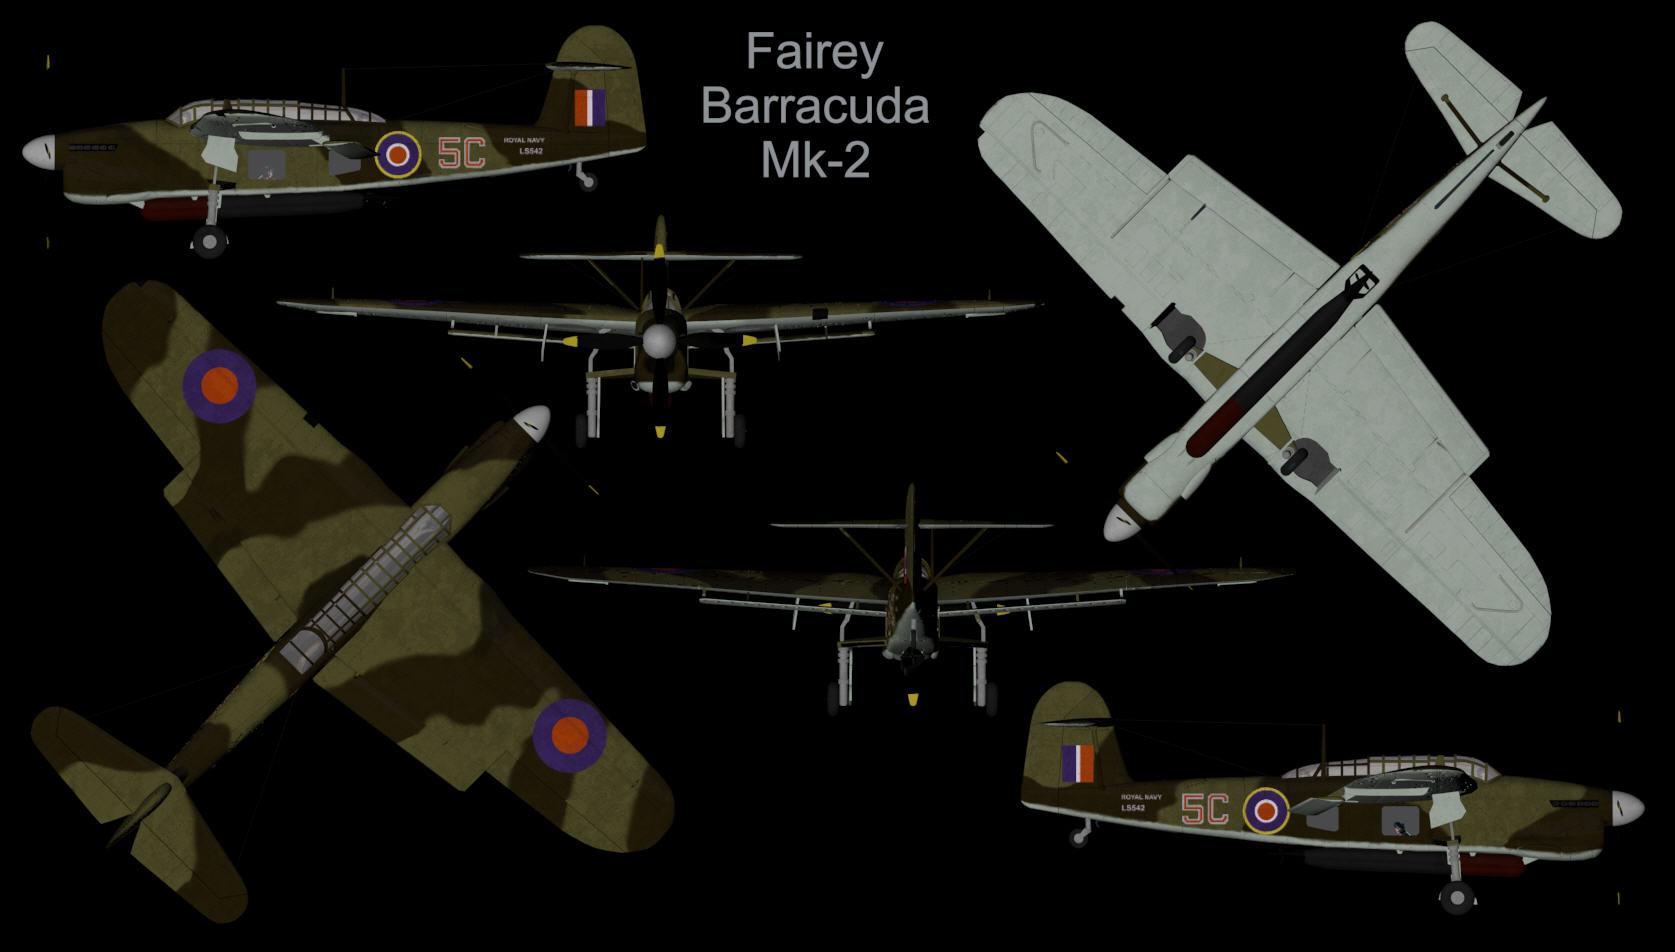 Fairey Barracuda Mk-2